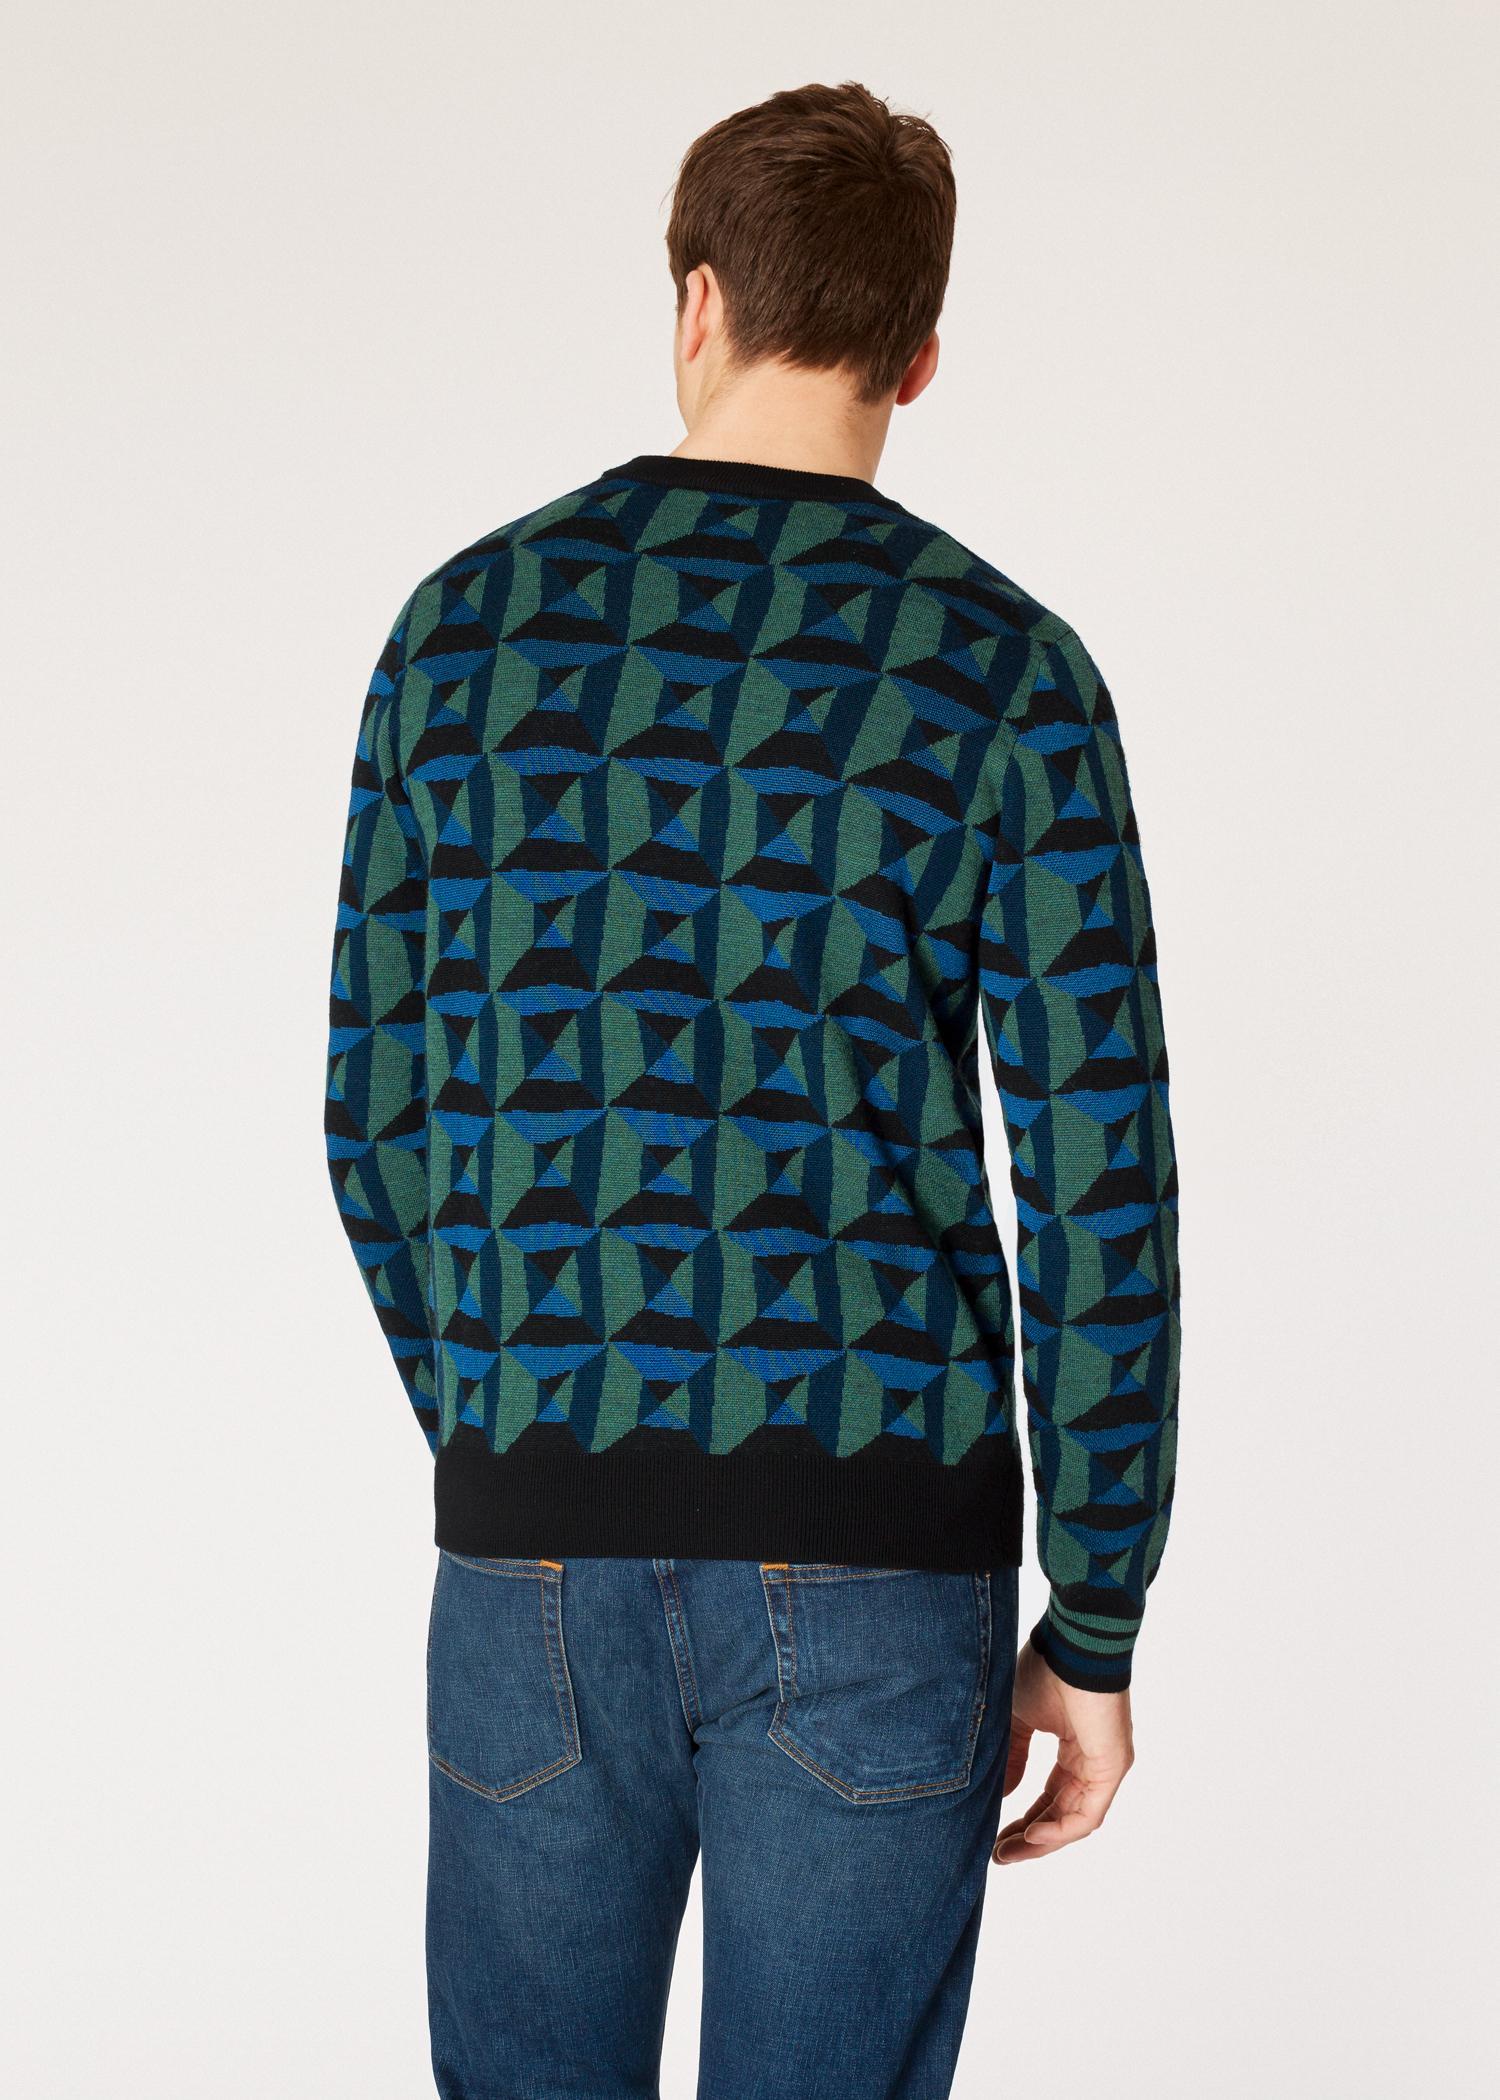 af2ffe79ab Lyst - Paul Smith Blue And Green Geometric Merino Wool-blend Sweater ...